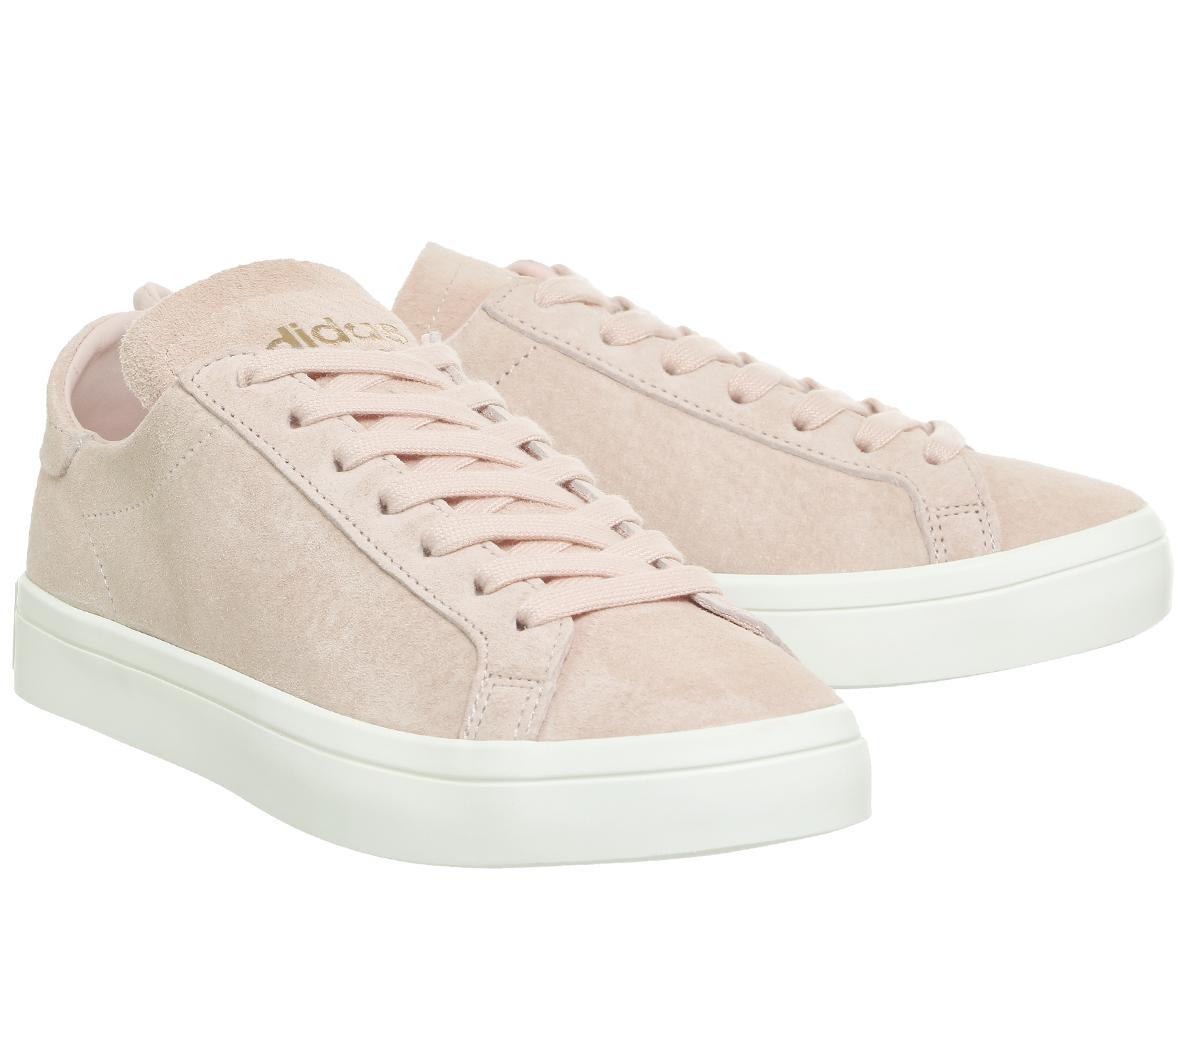 adidas Originals COURTVANTAGE - EXCLUSIVE - Trainers - vapour grey/footwear white 3czoO5m